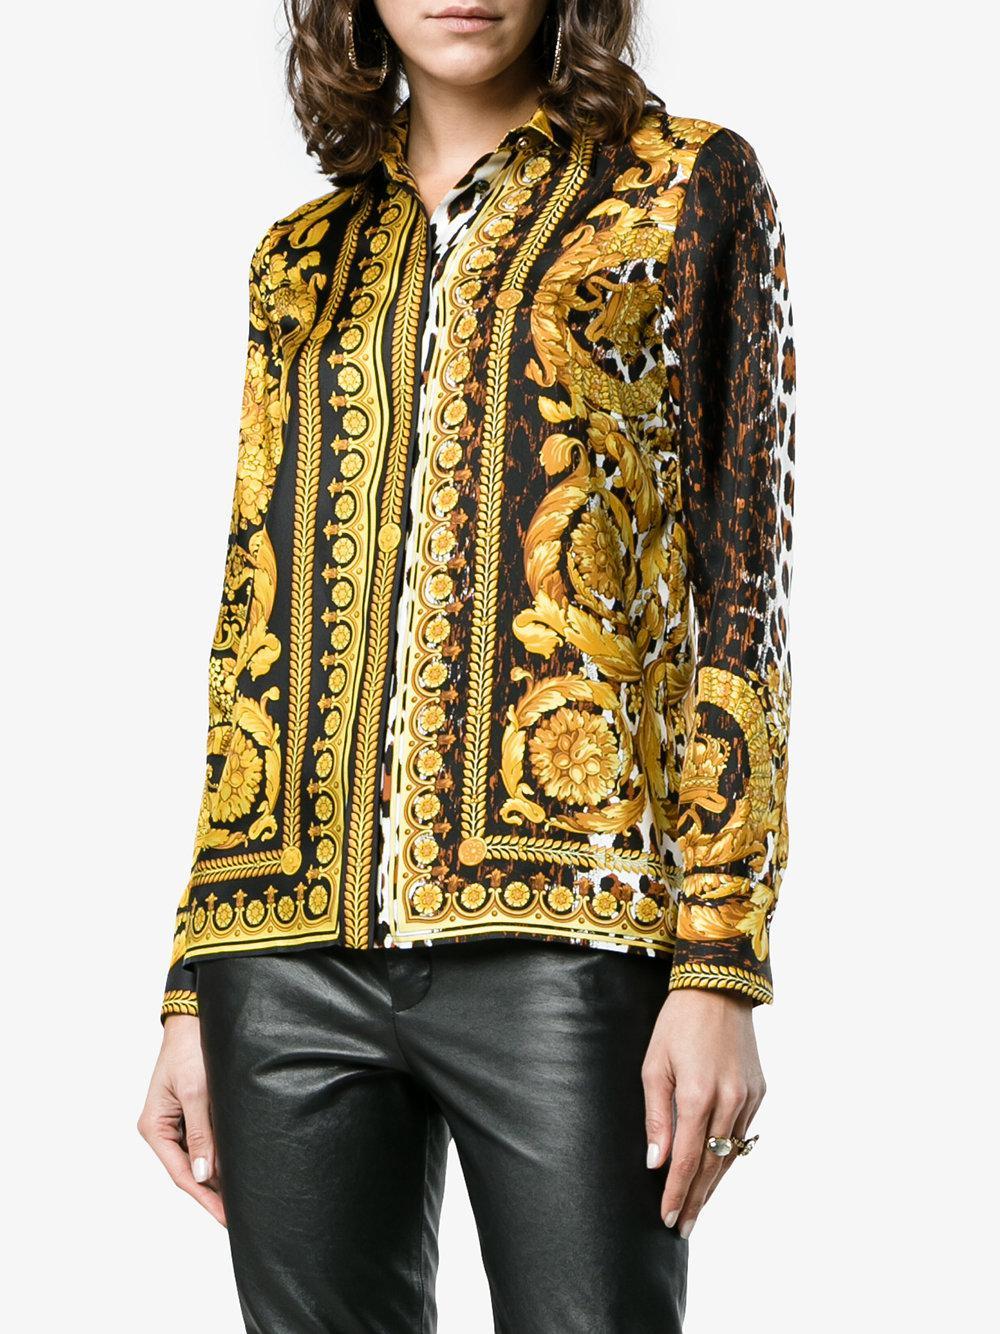 cb53618dc1f13c Versace - Black Barocco Fw  91 Silk Shirt - Lyst. View fullscreen